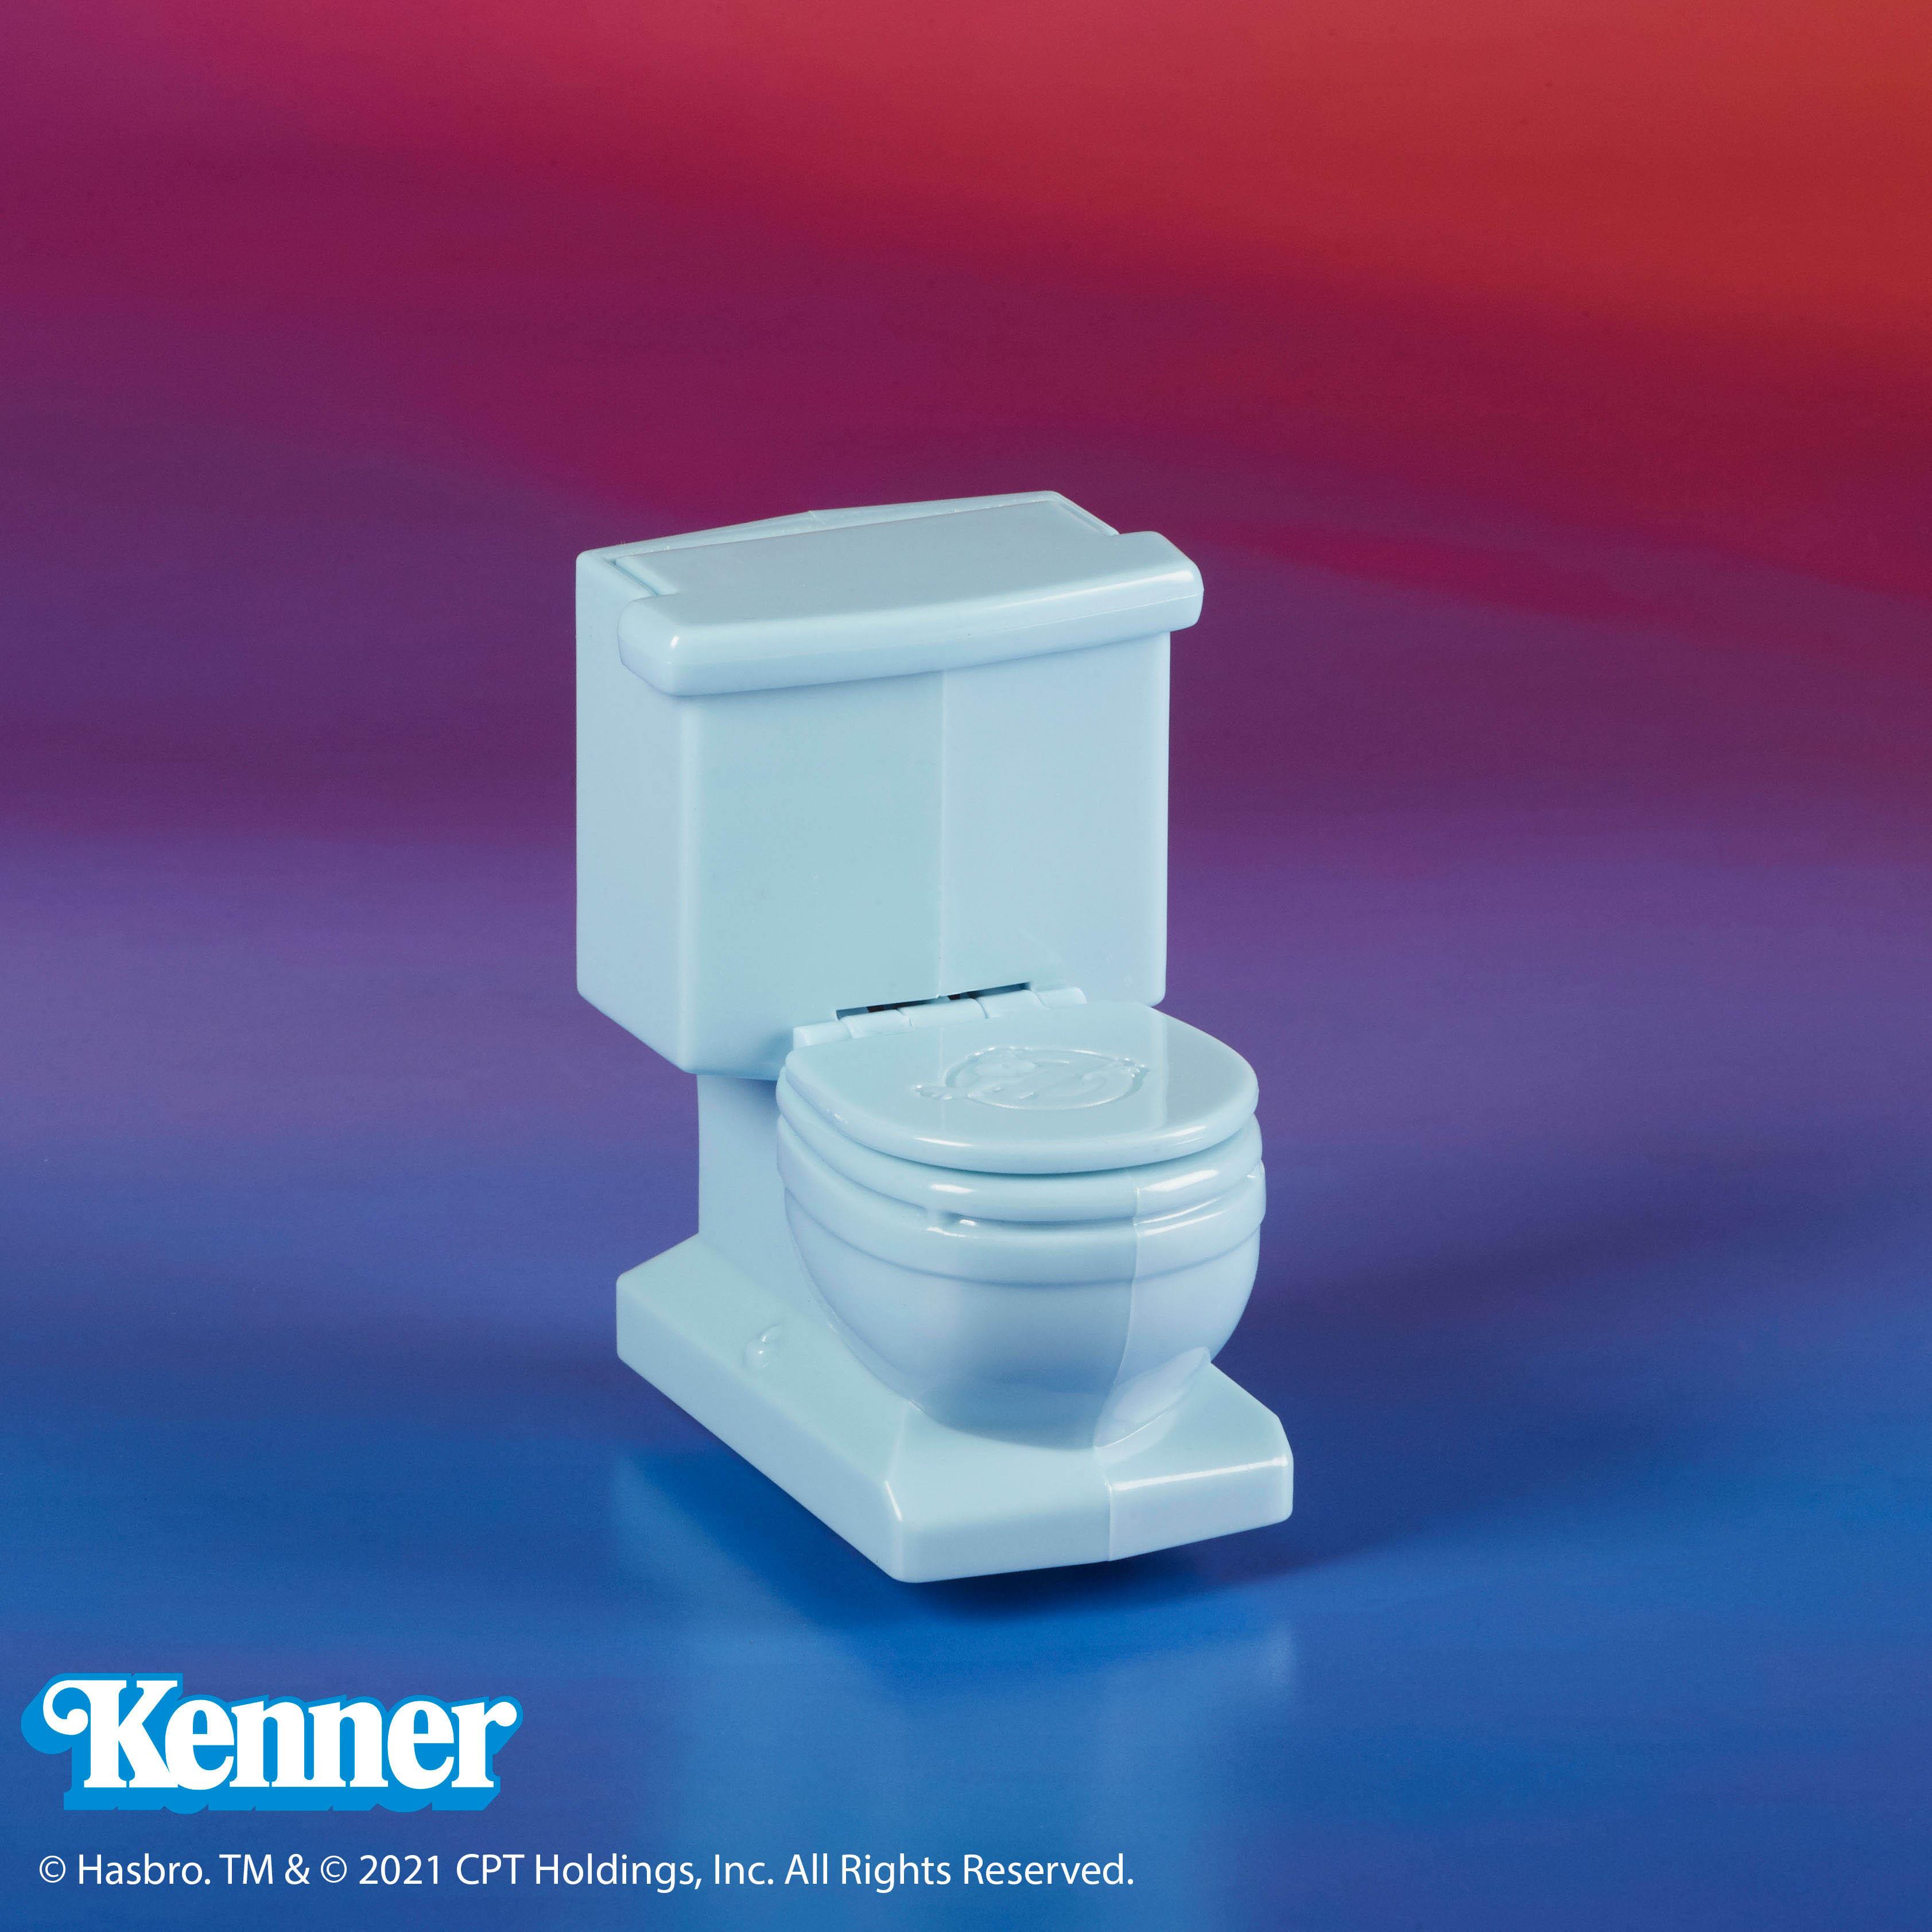 Kenner Fearsome Flush